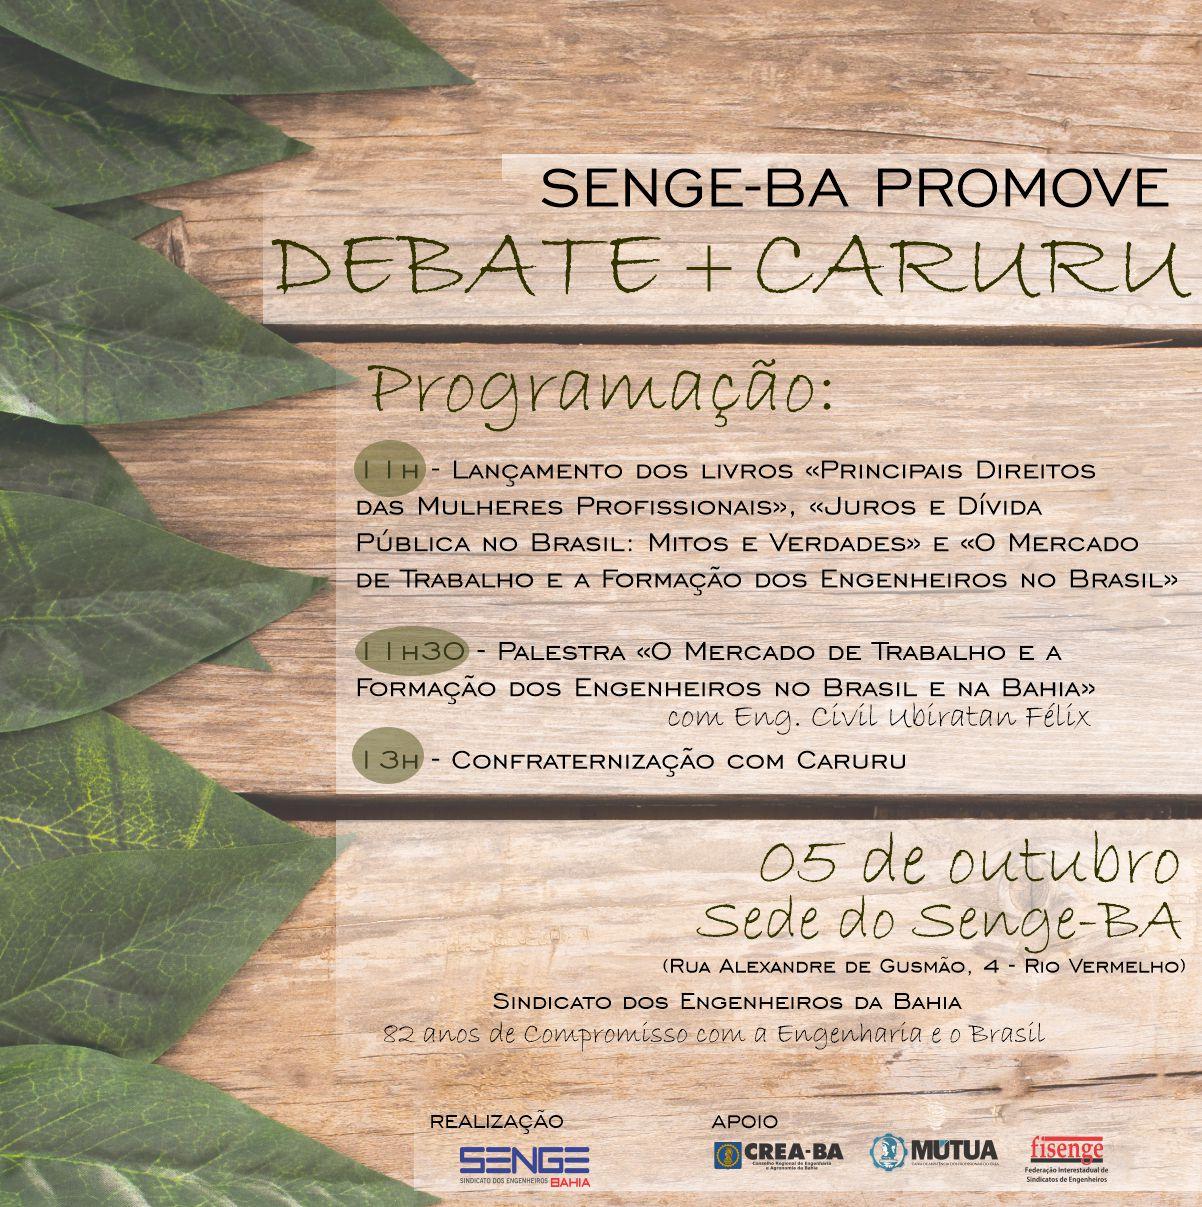 Senge-BA realiza debate+caruru no dia 05 de outubro